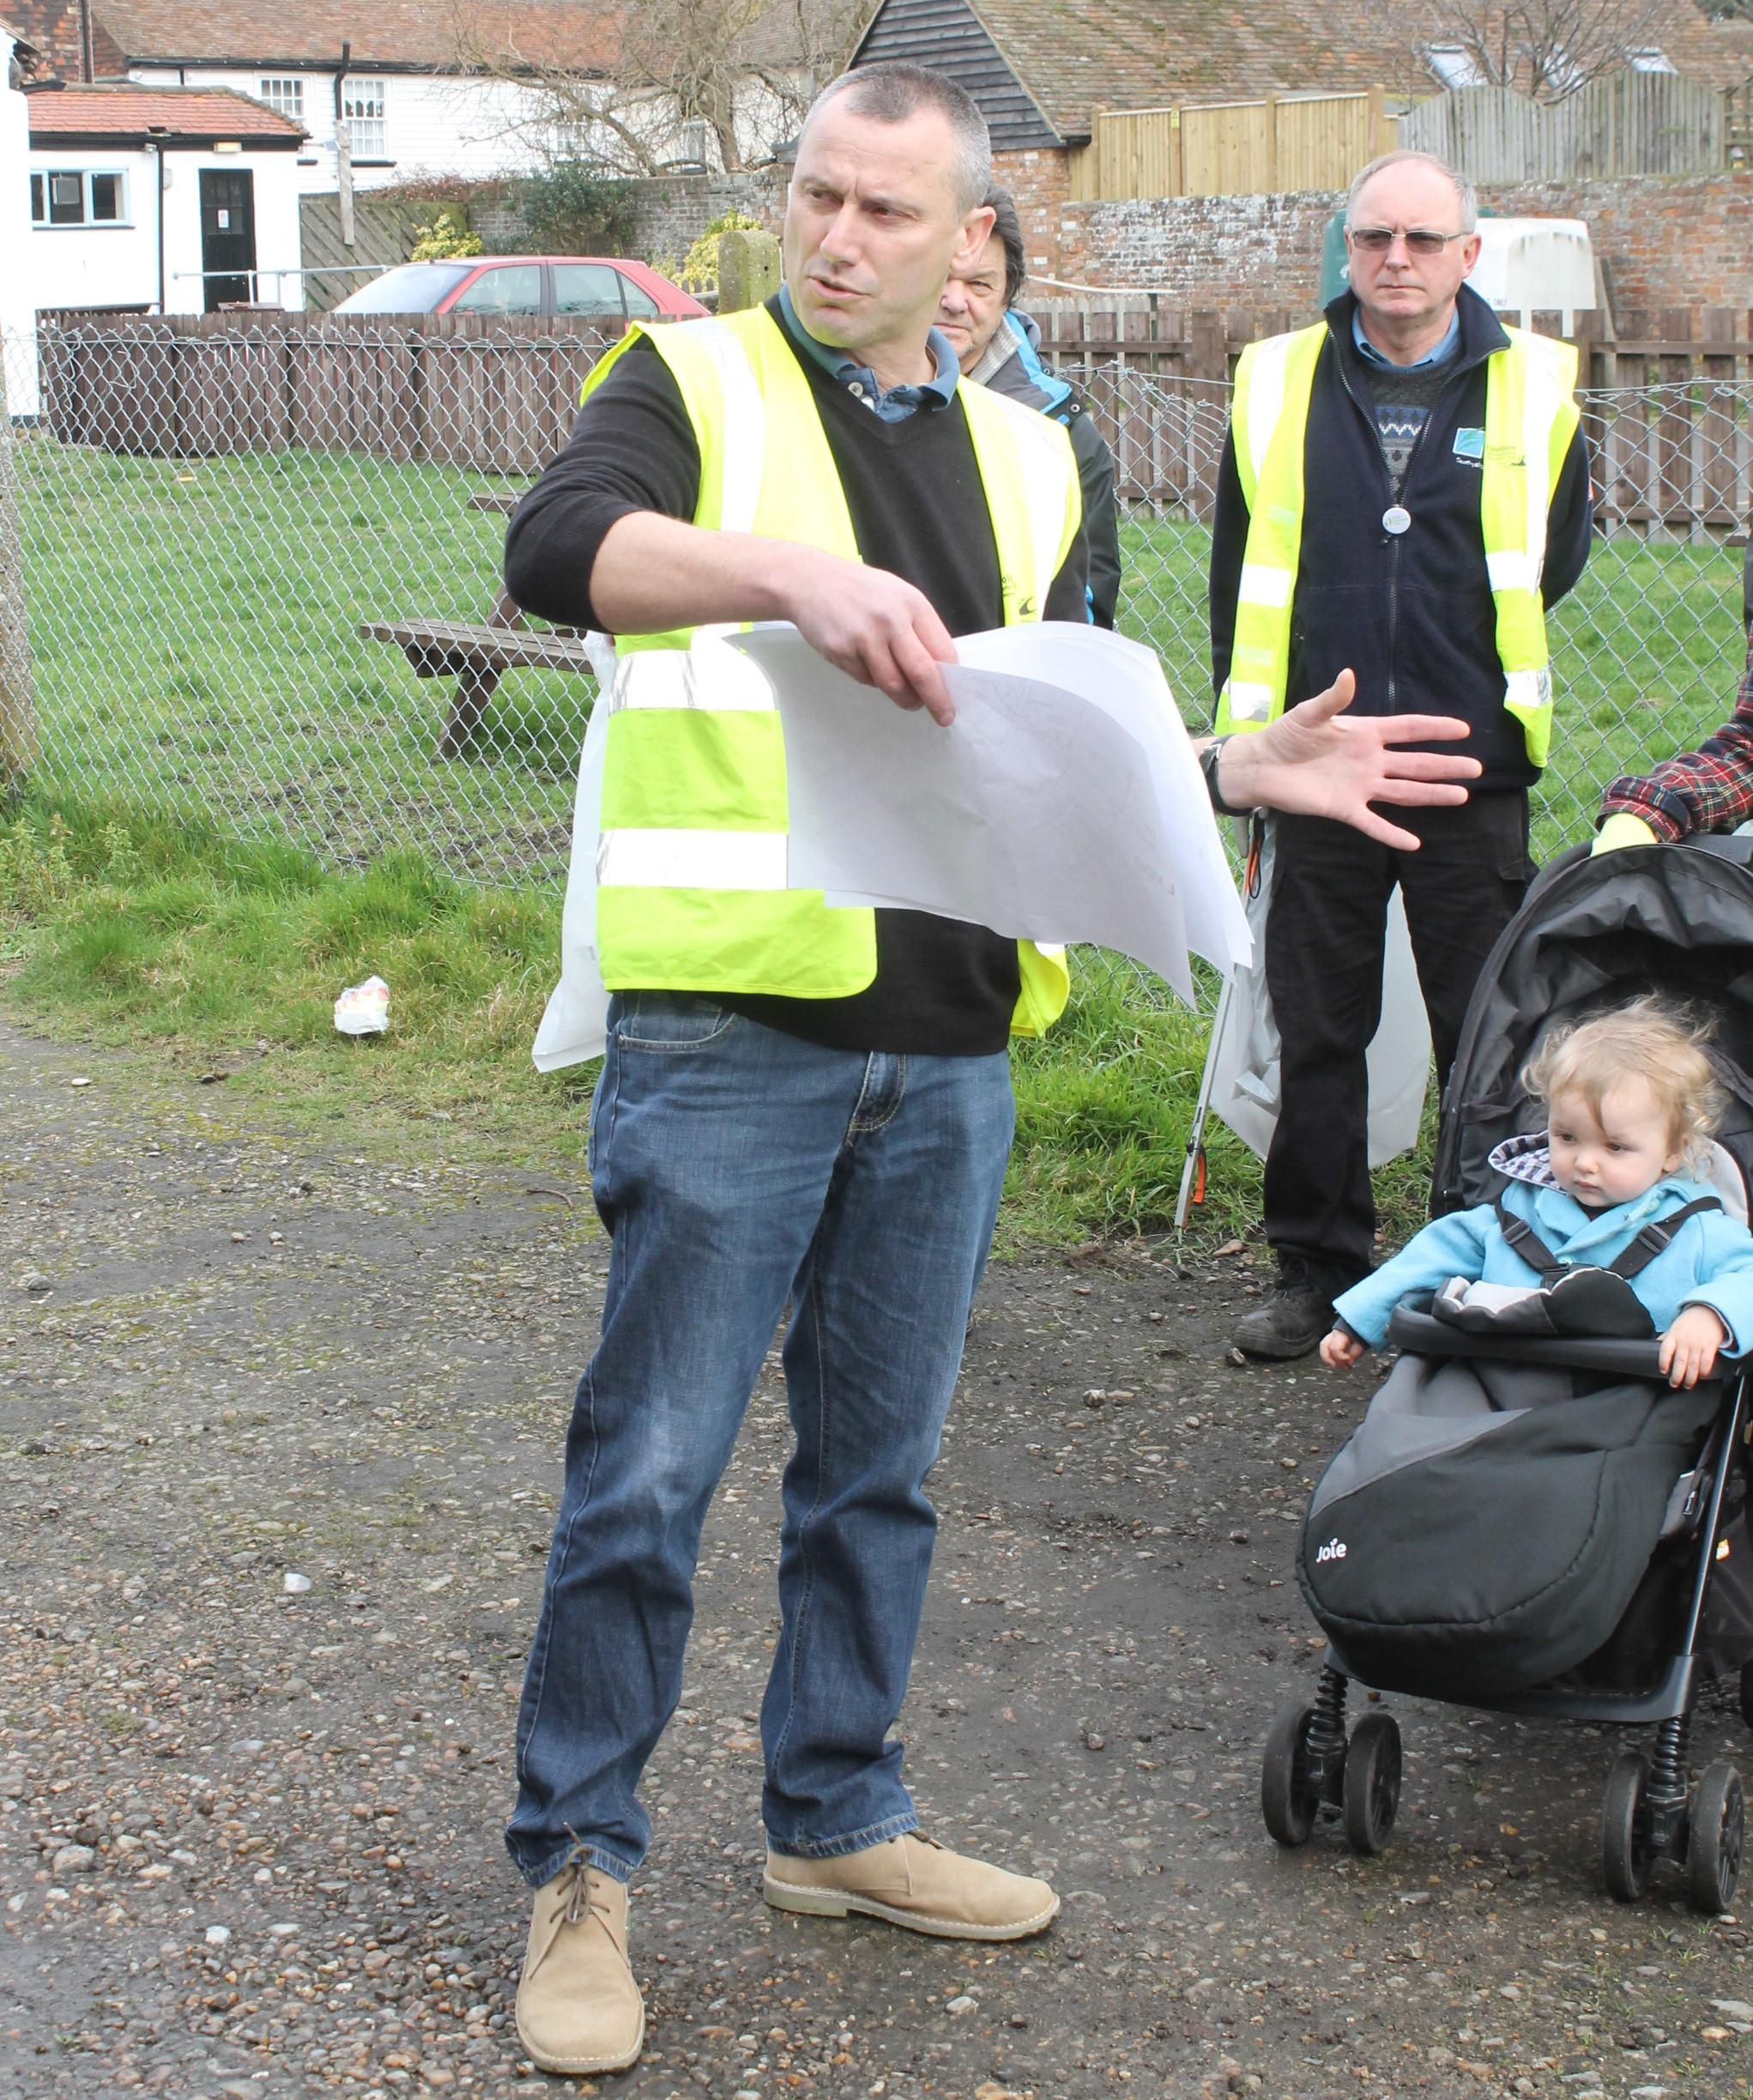 organiser Clive Goddard...Talks Rubbish